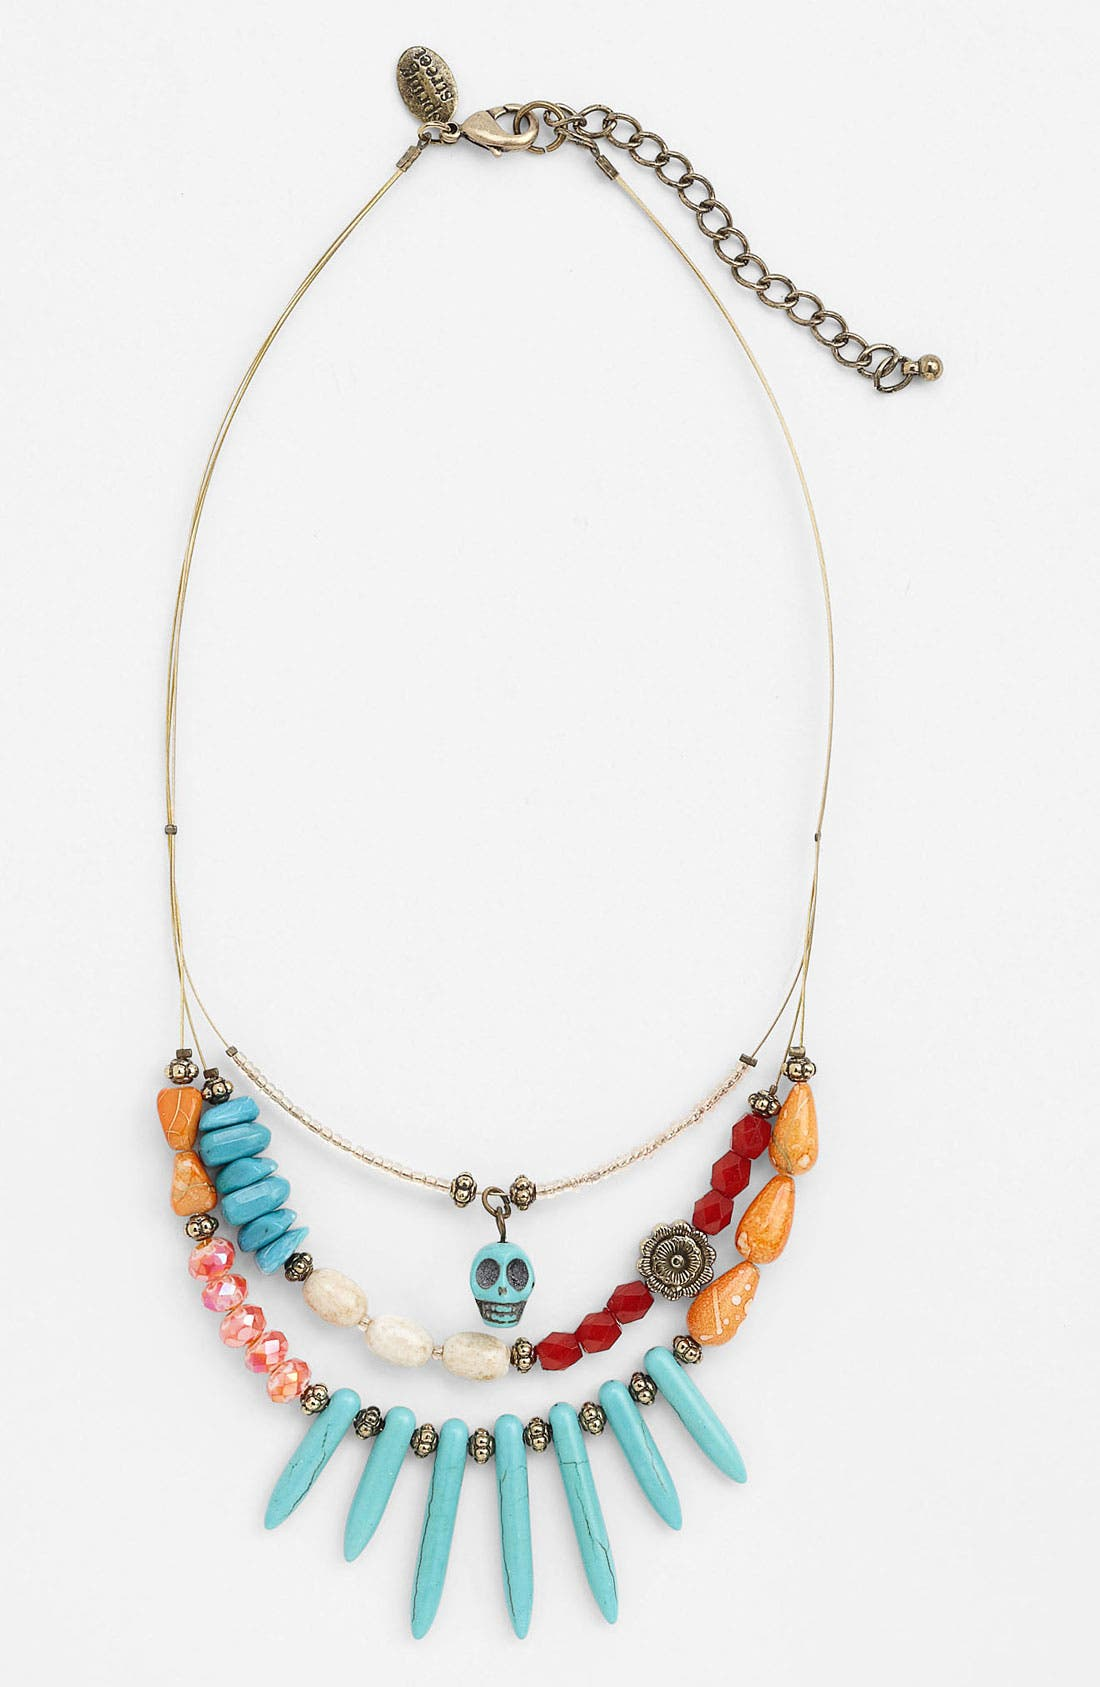 Alternate Image 1 Selected - Spring Street Multistrand Skull Necklace (Nordstrom Exclusive)